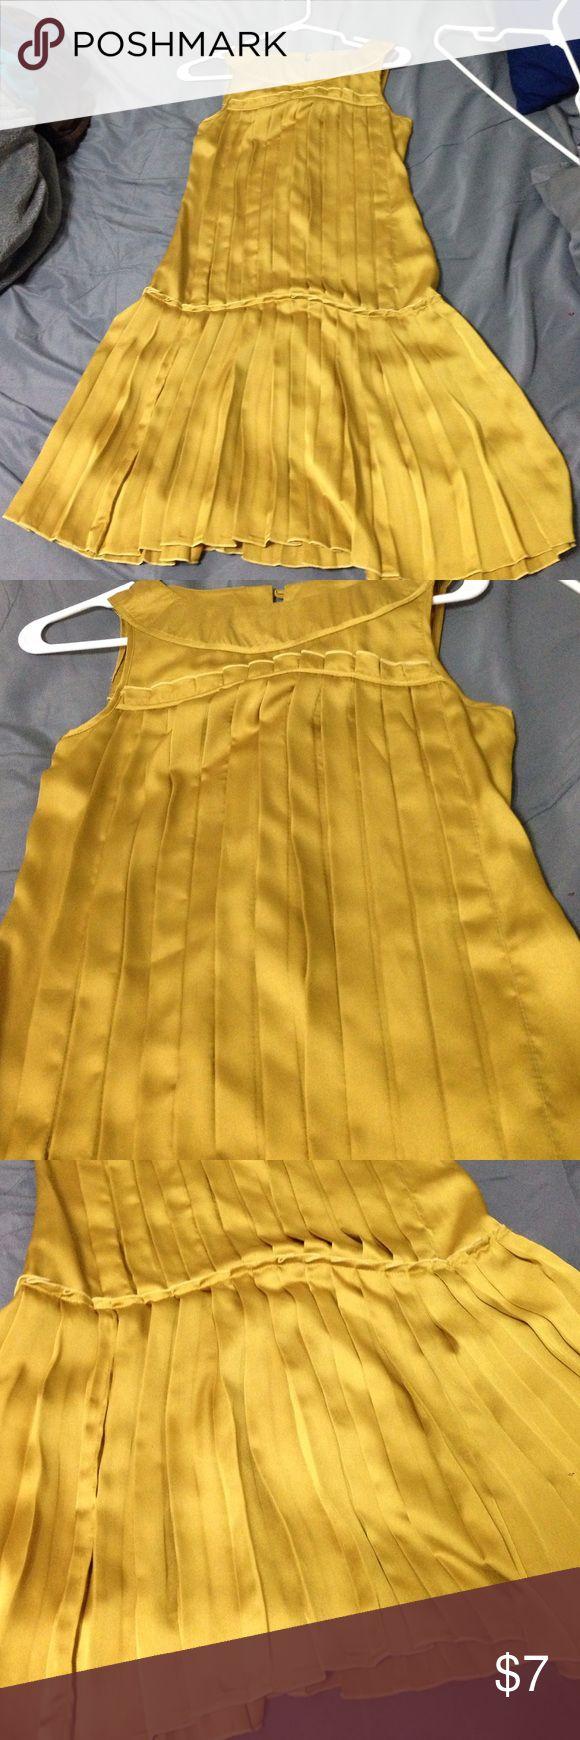 yellow dress design are